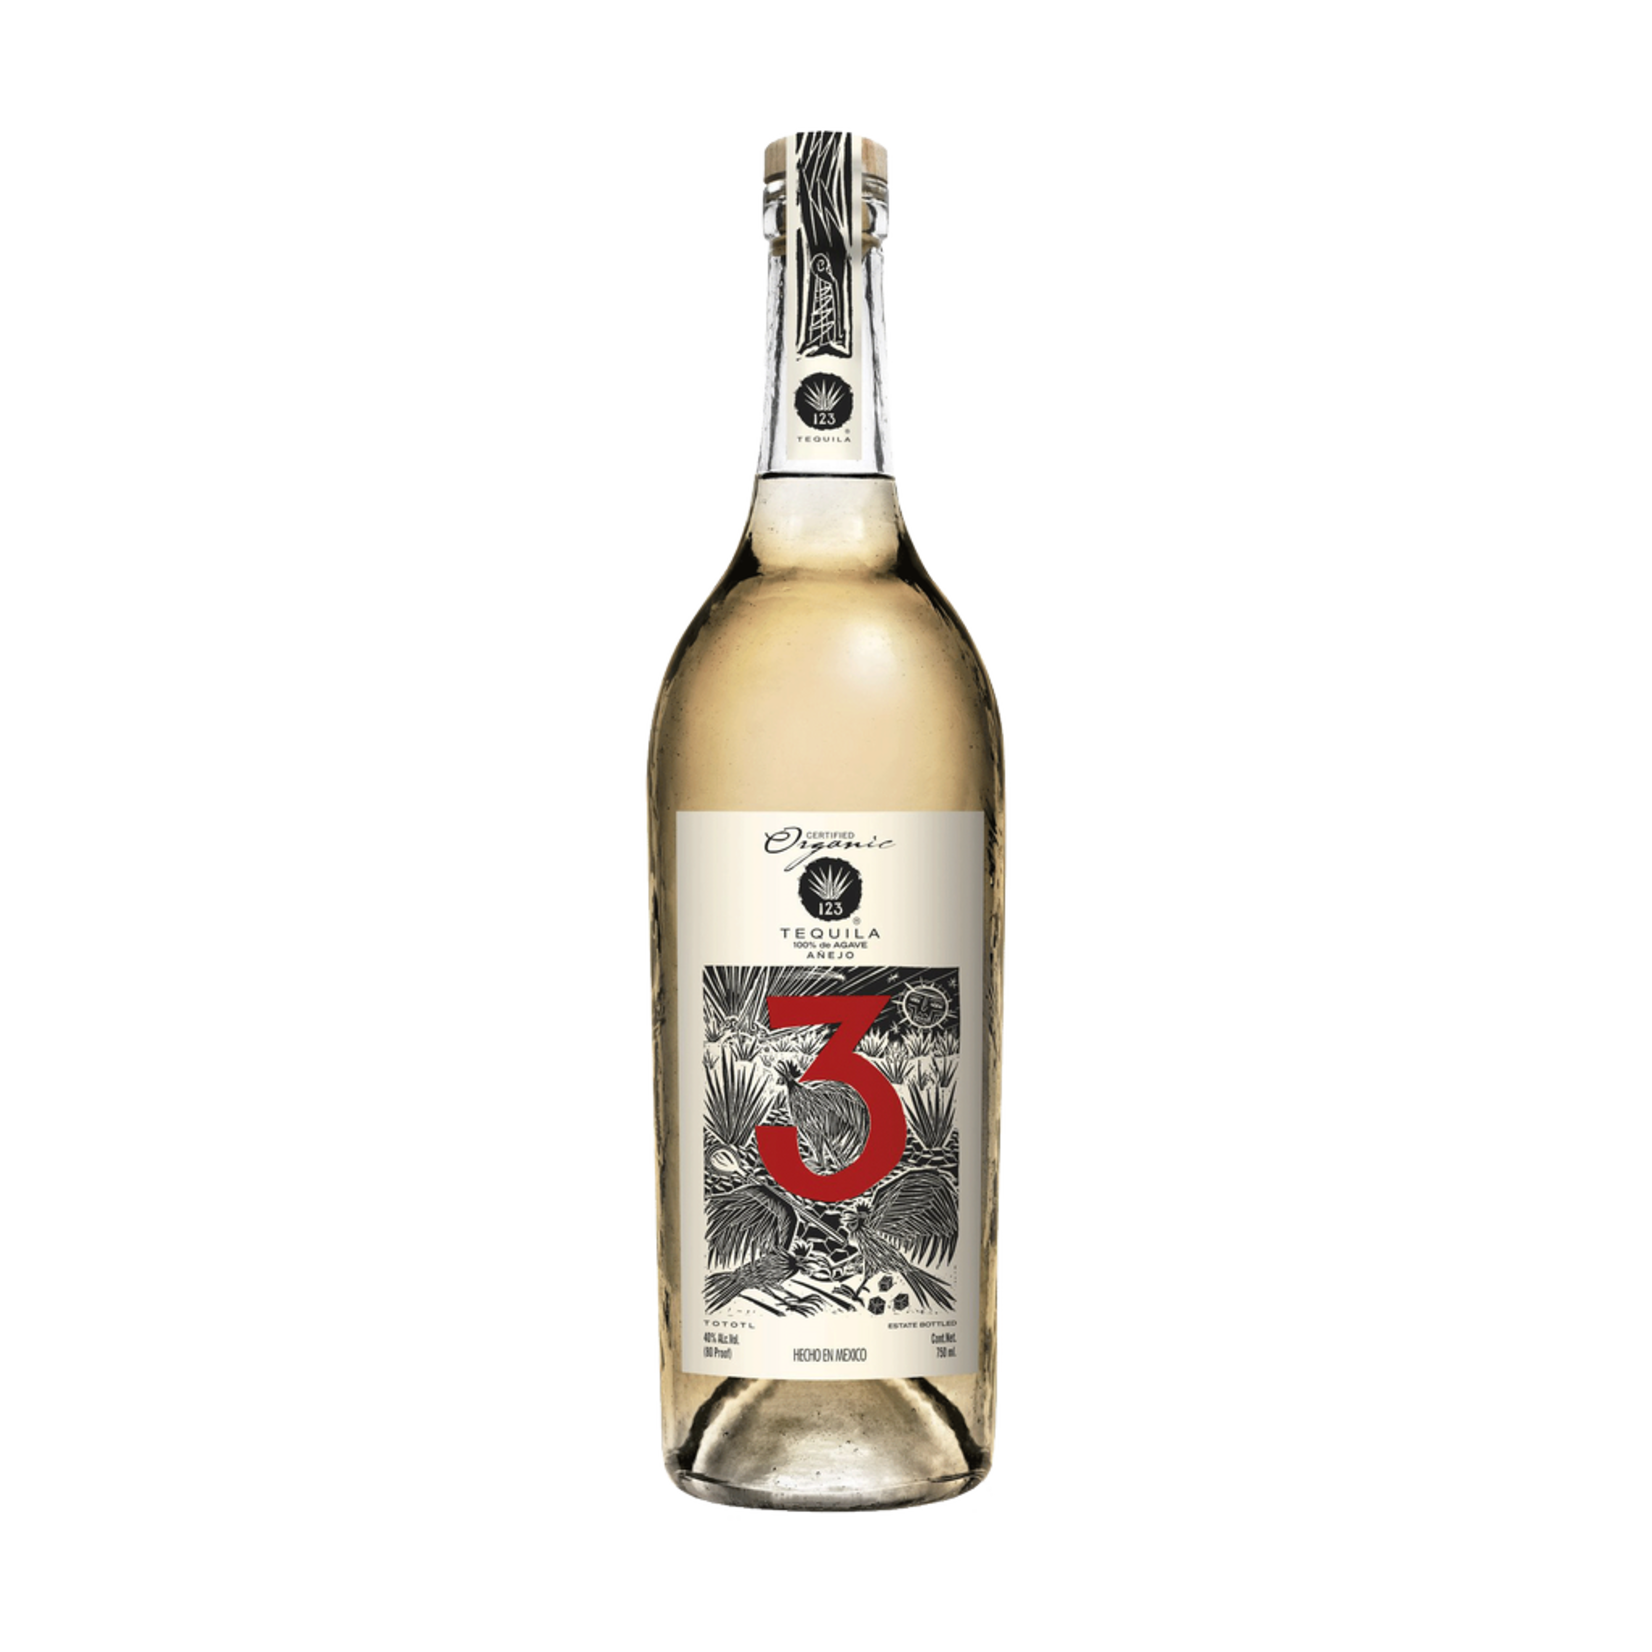 Spirits 123 Organic Tequila #3 Tres Anejo Tequila